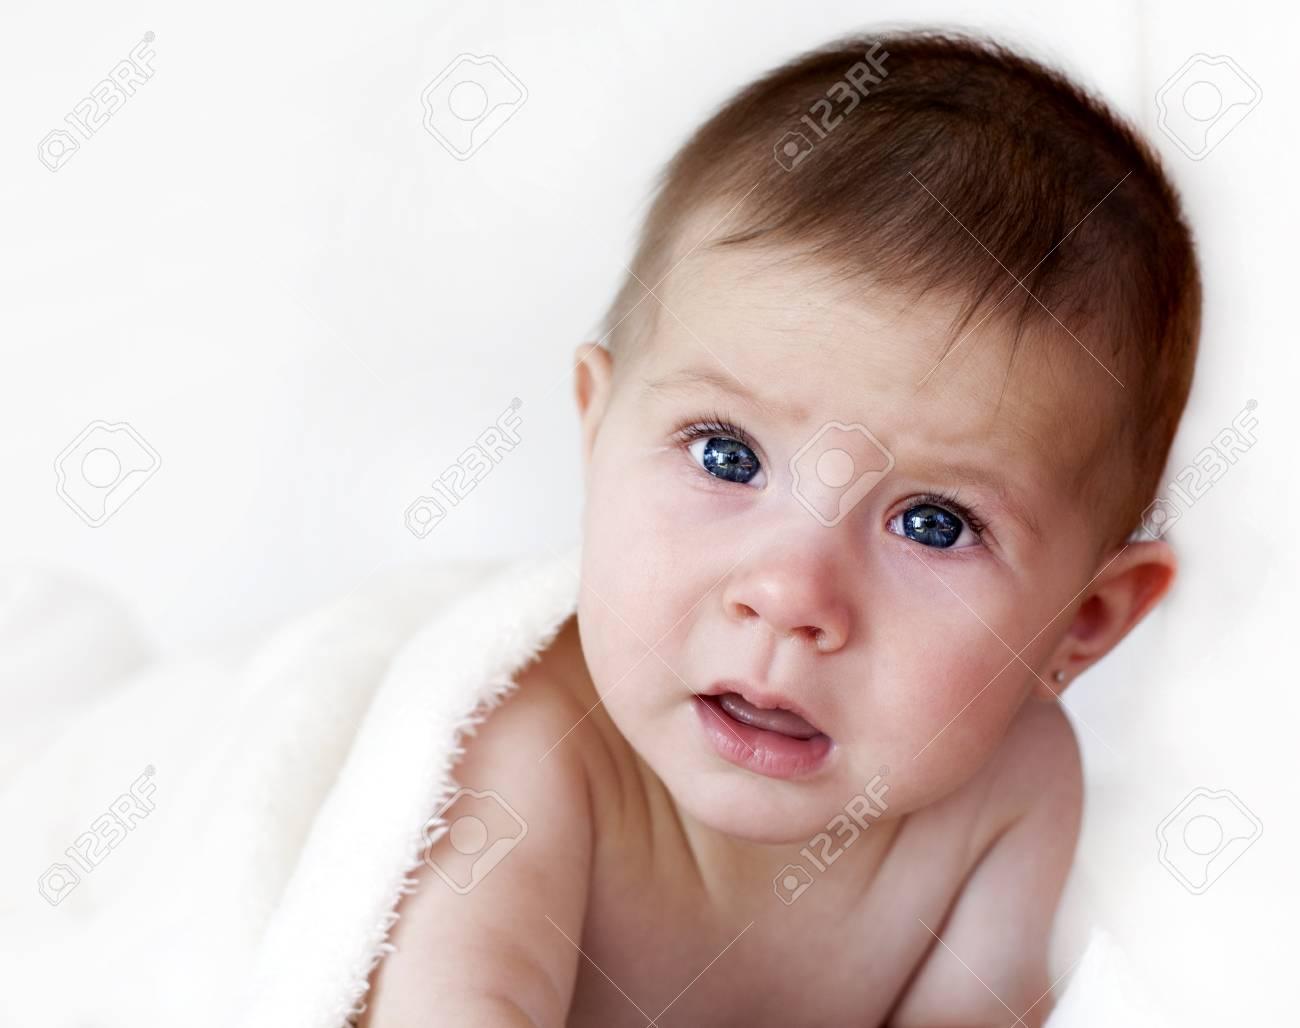 baby girl is sad under white blanket Stock Photo - 17573552